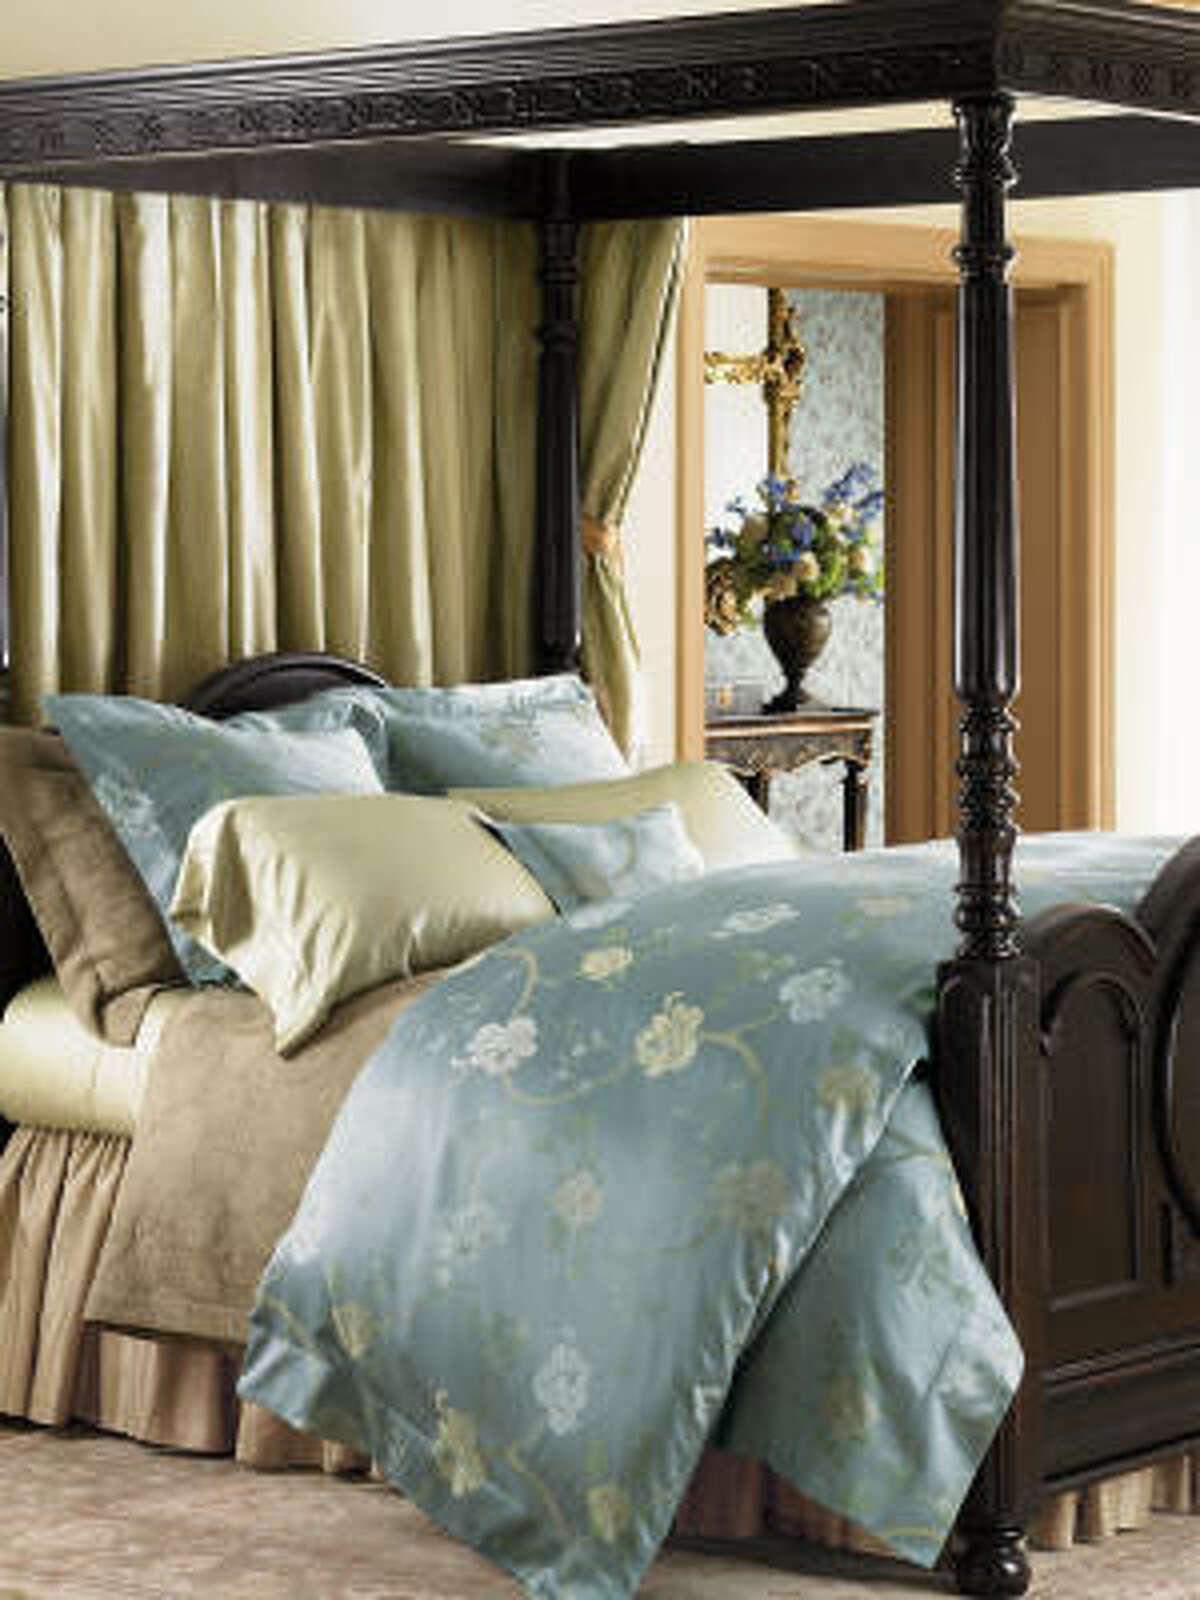 Witney bedding from Sferra, $111-$1,005, sferra.com.